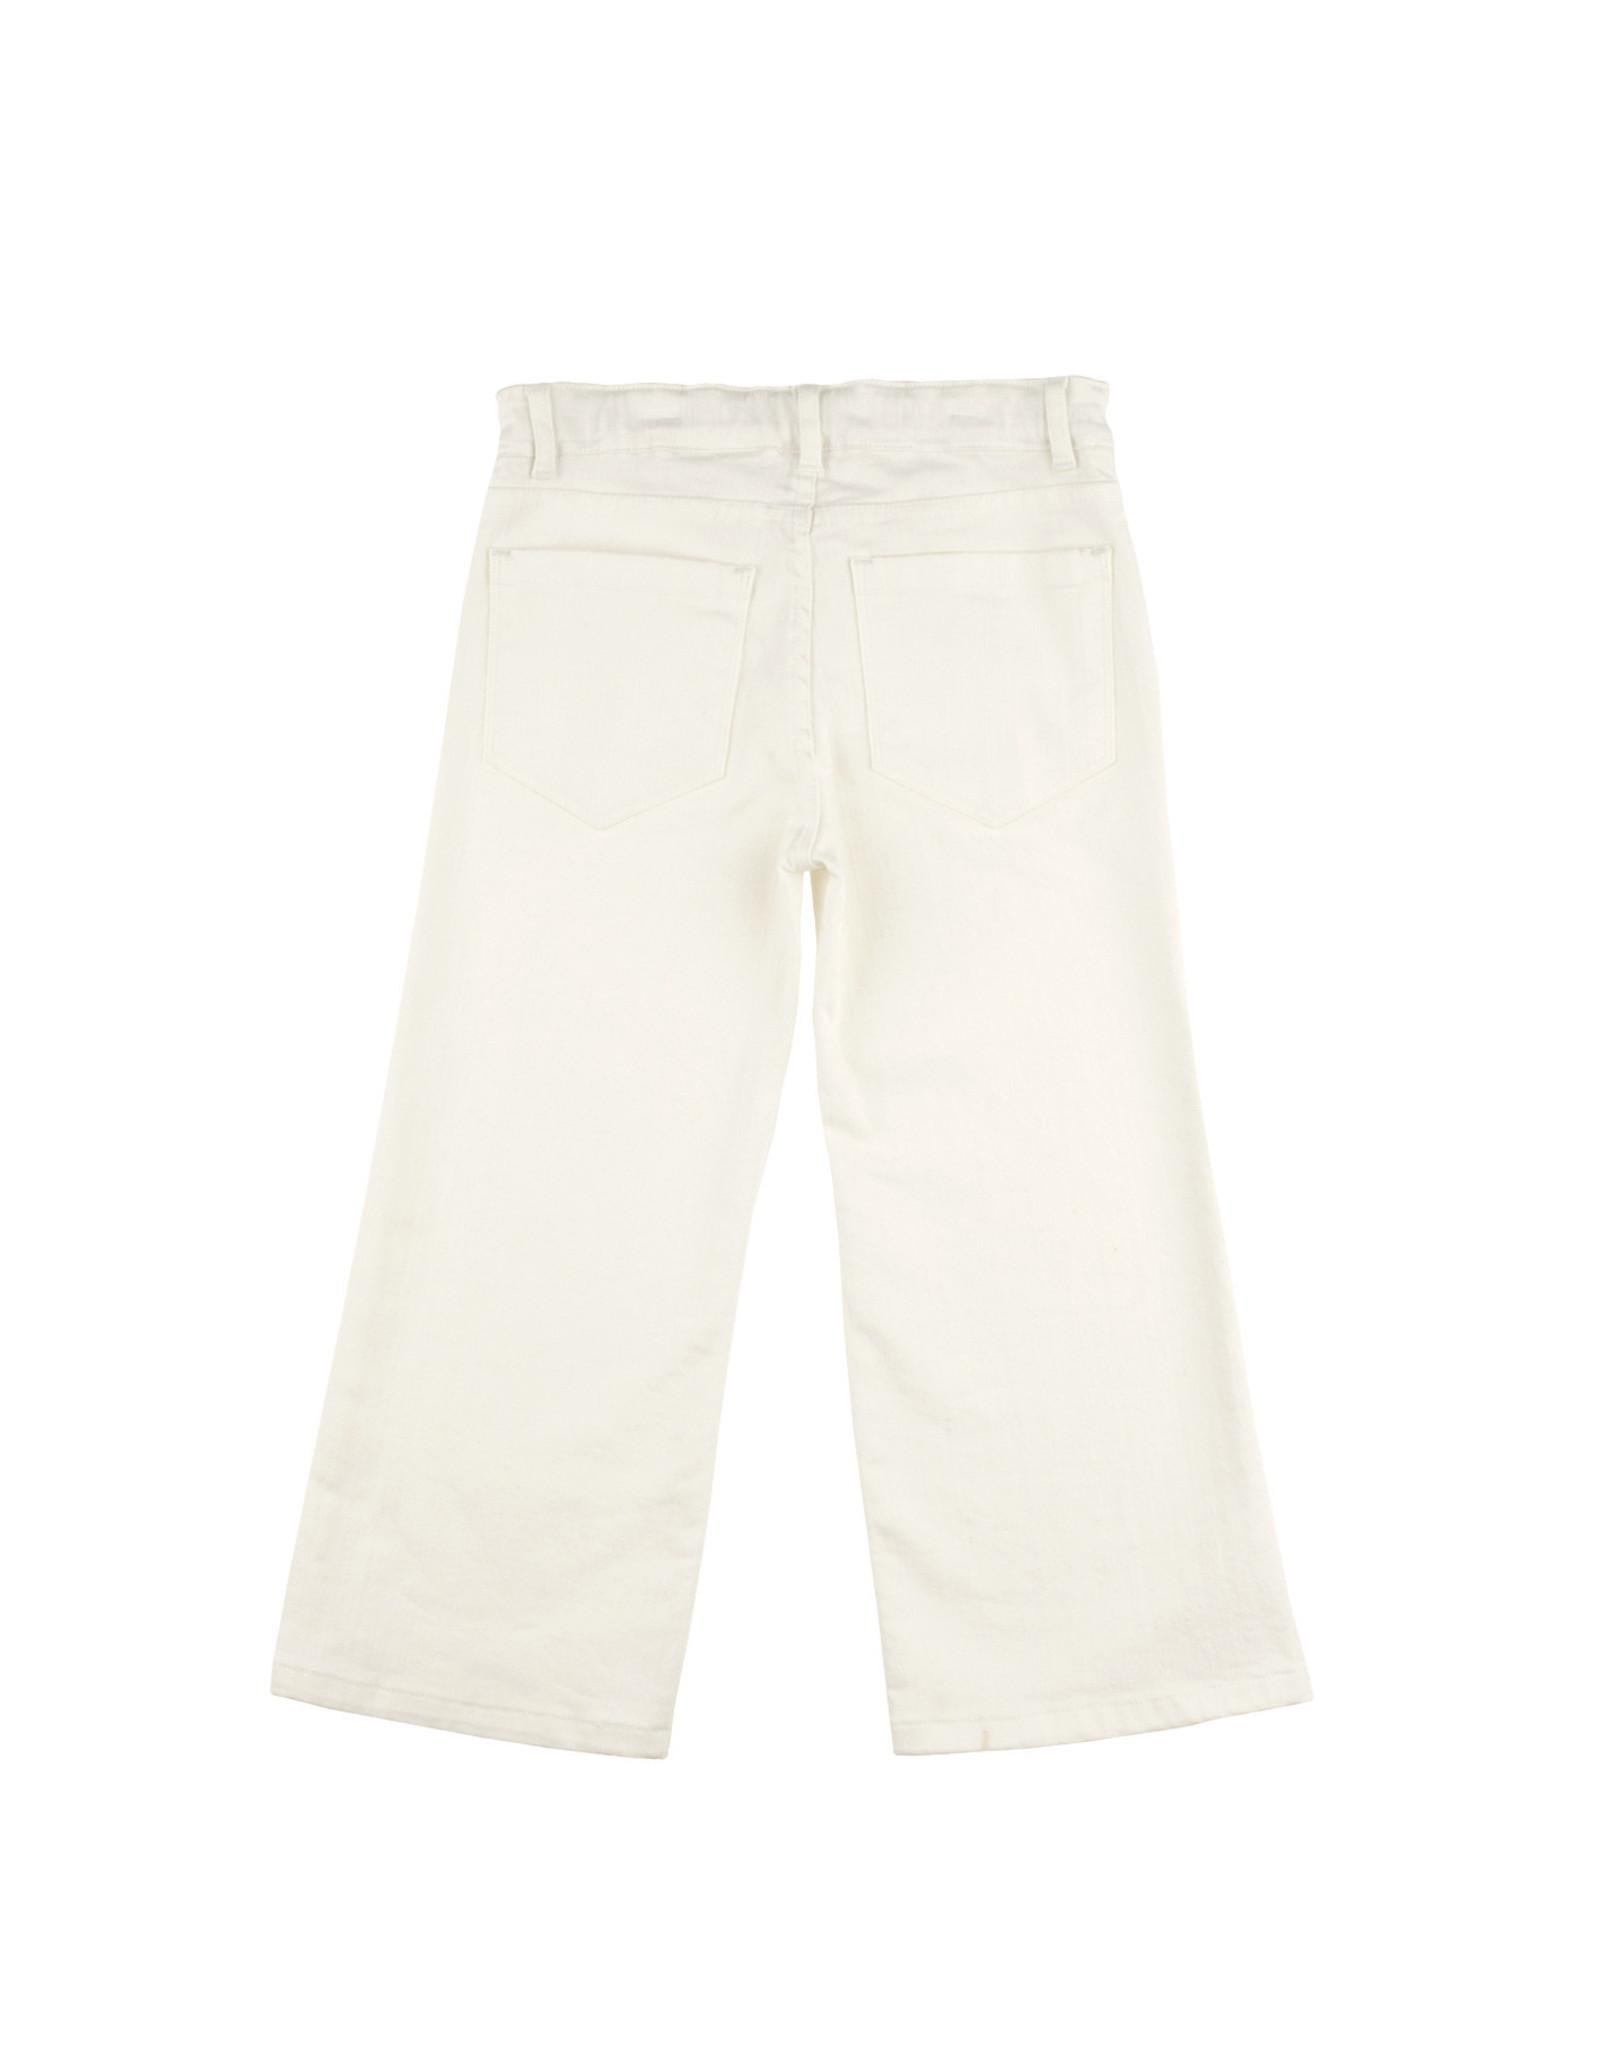 Large jeans